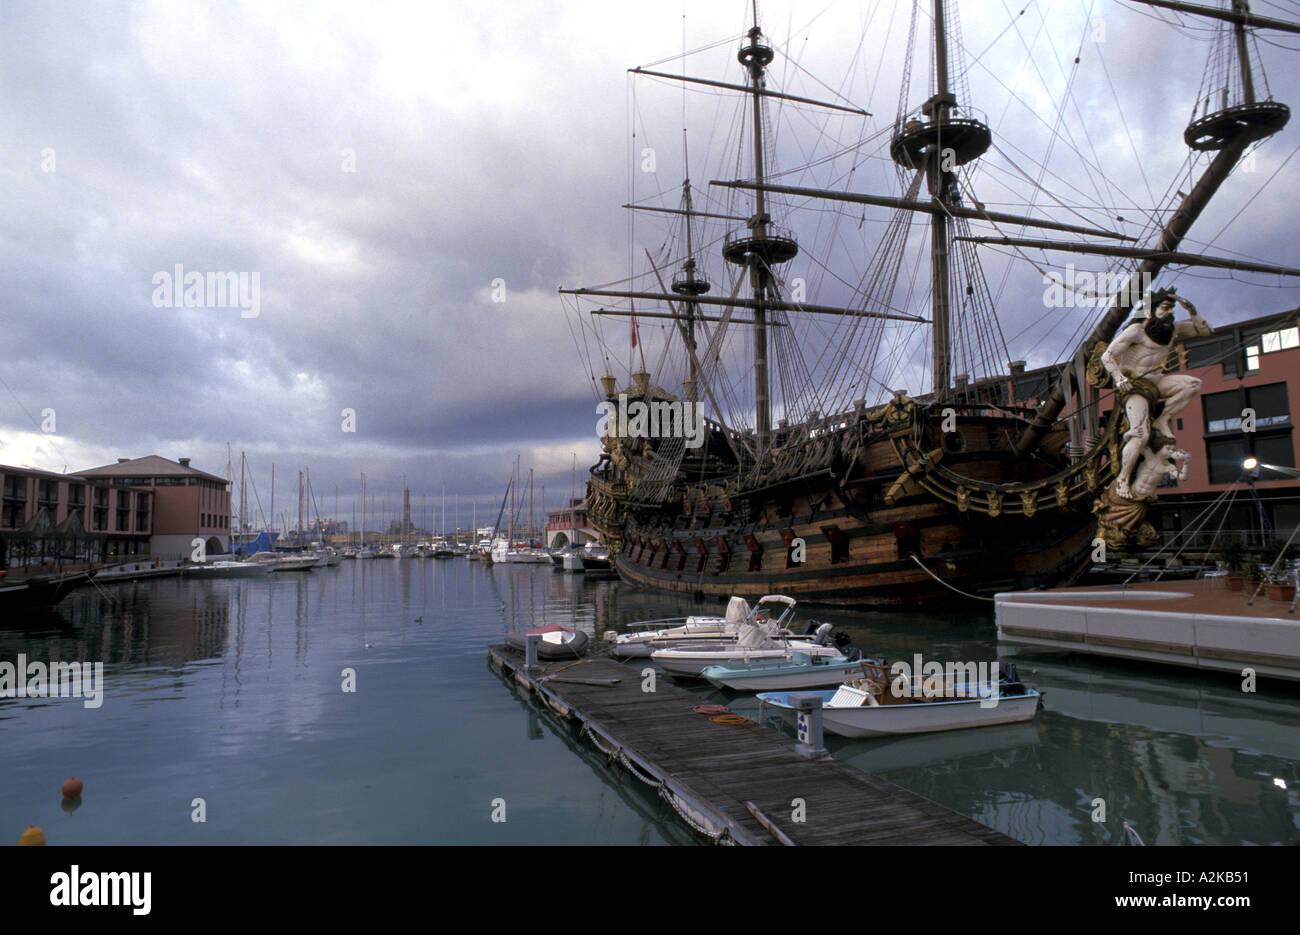 Pirates galleon - Stock Image